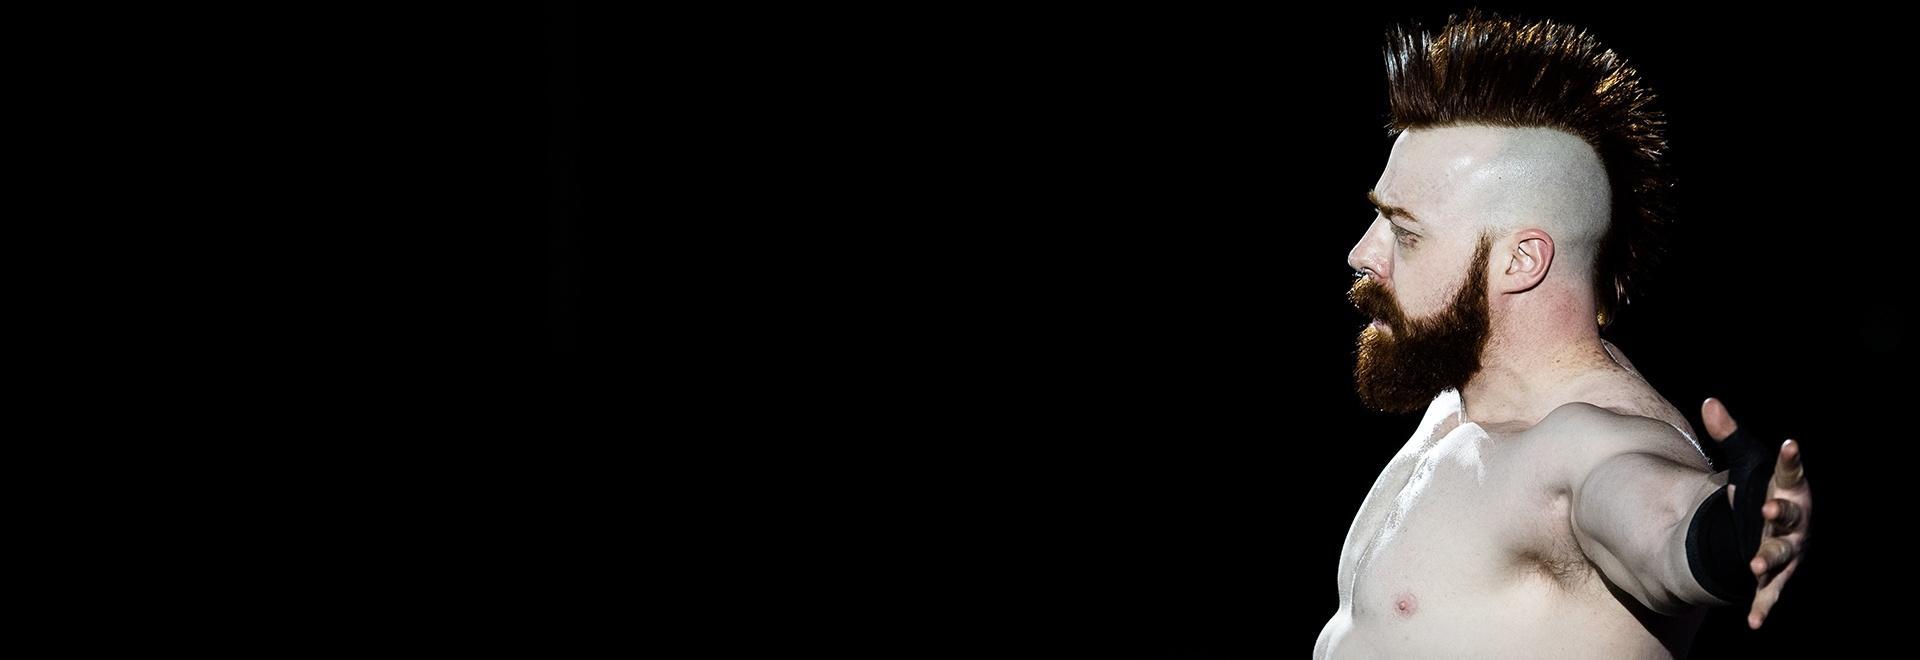 Ep 231